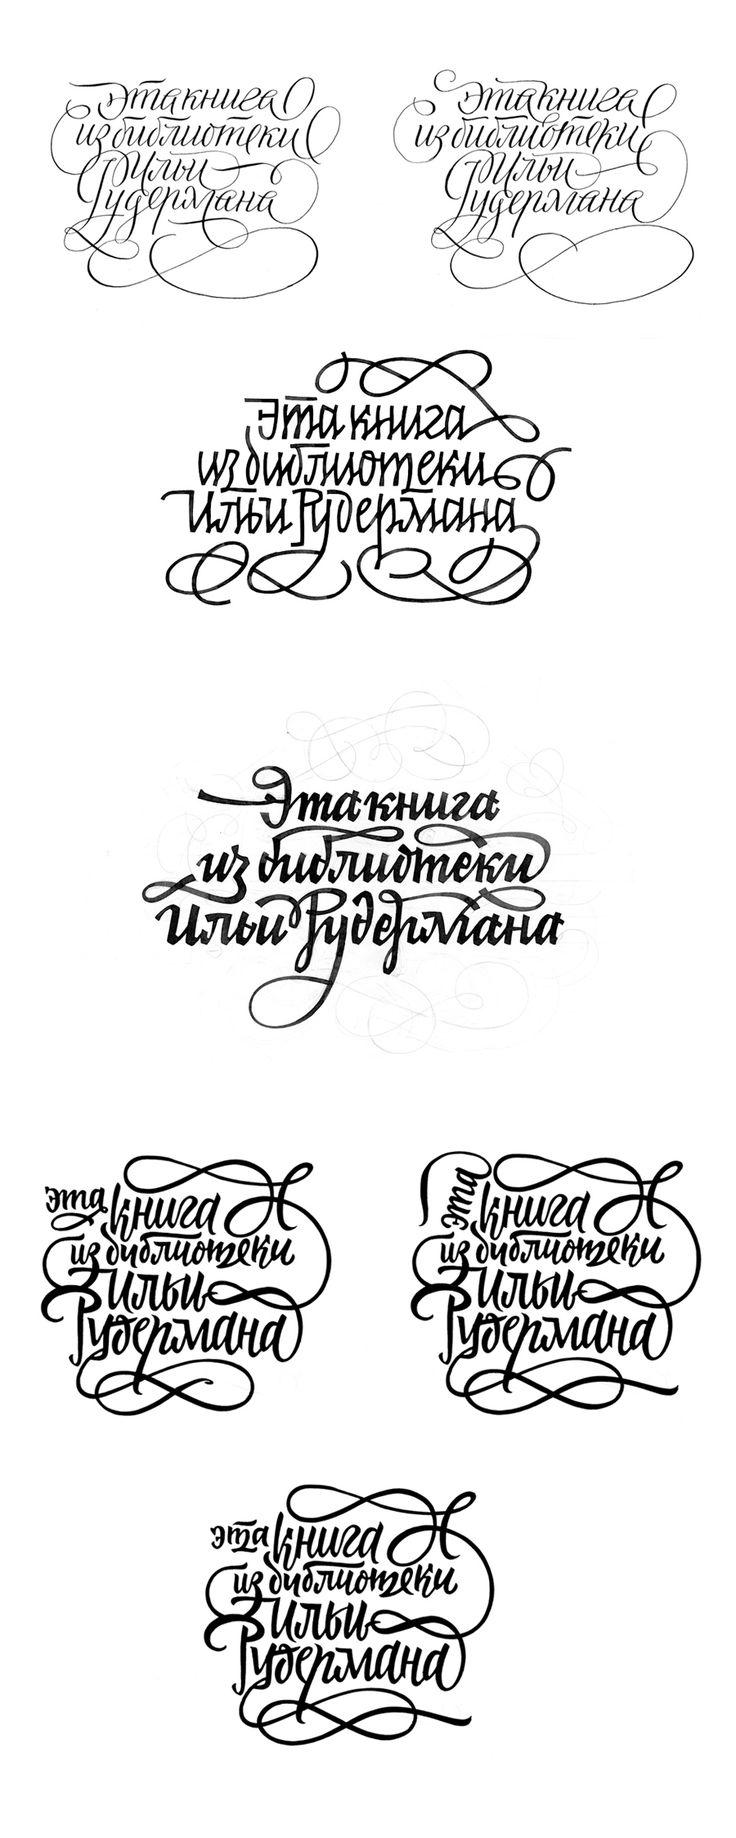 Ex libris for Ilya Ruderman